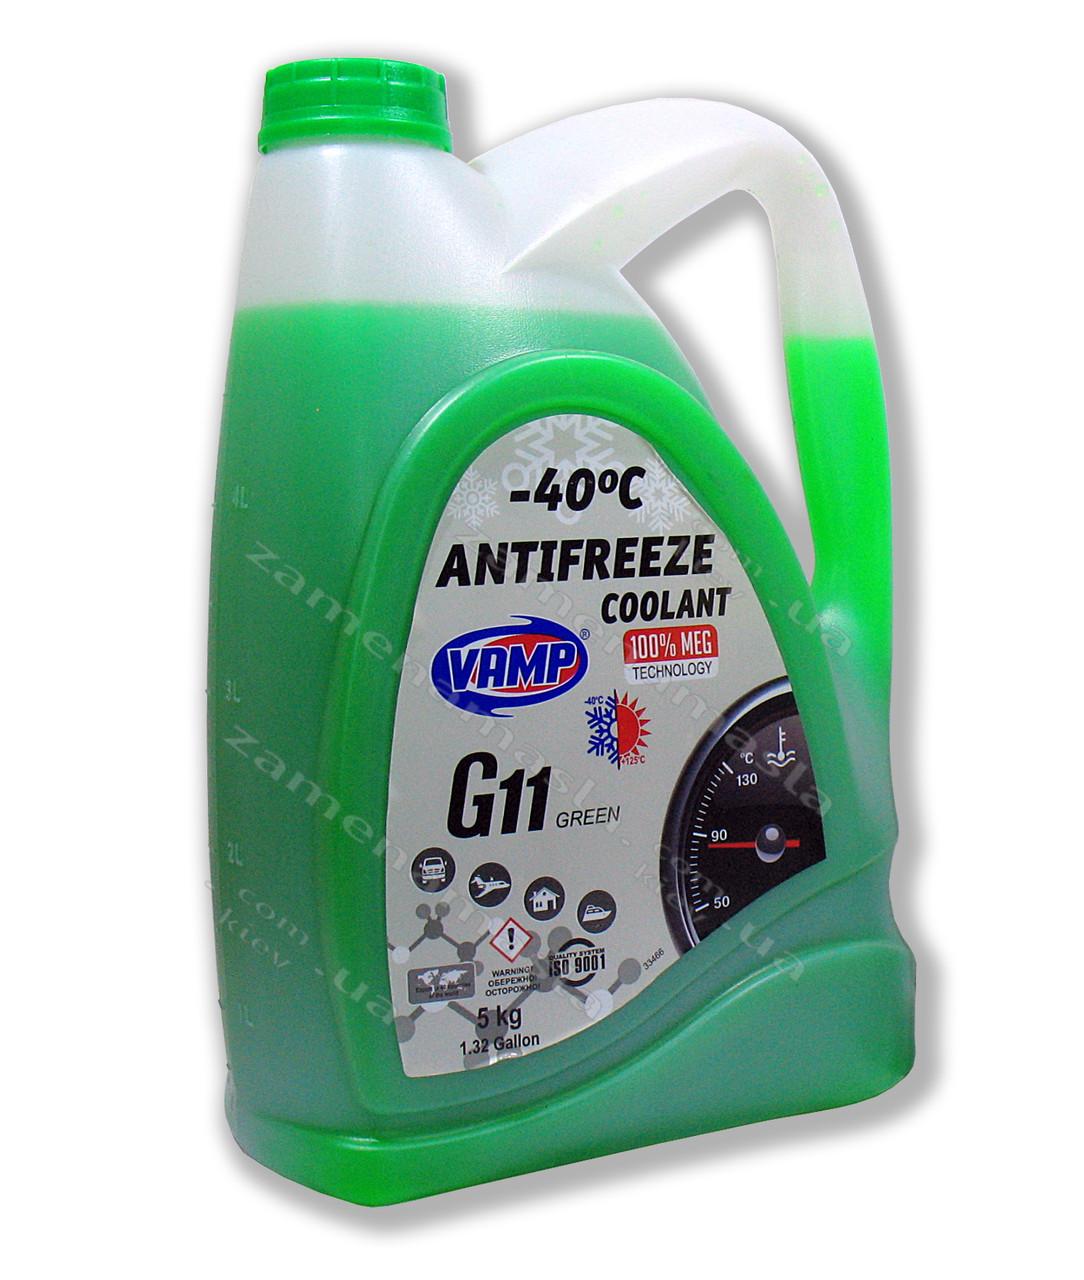 Антифриз G11 VAMP зелёный (МЭГ) 5л